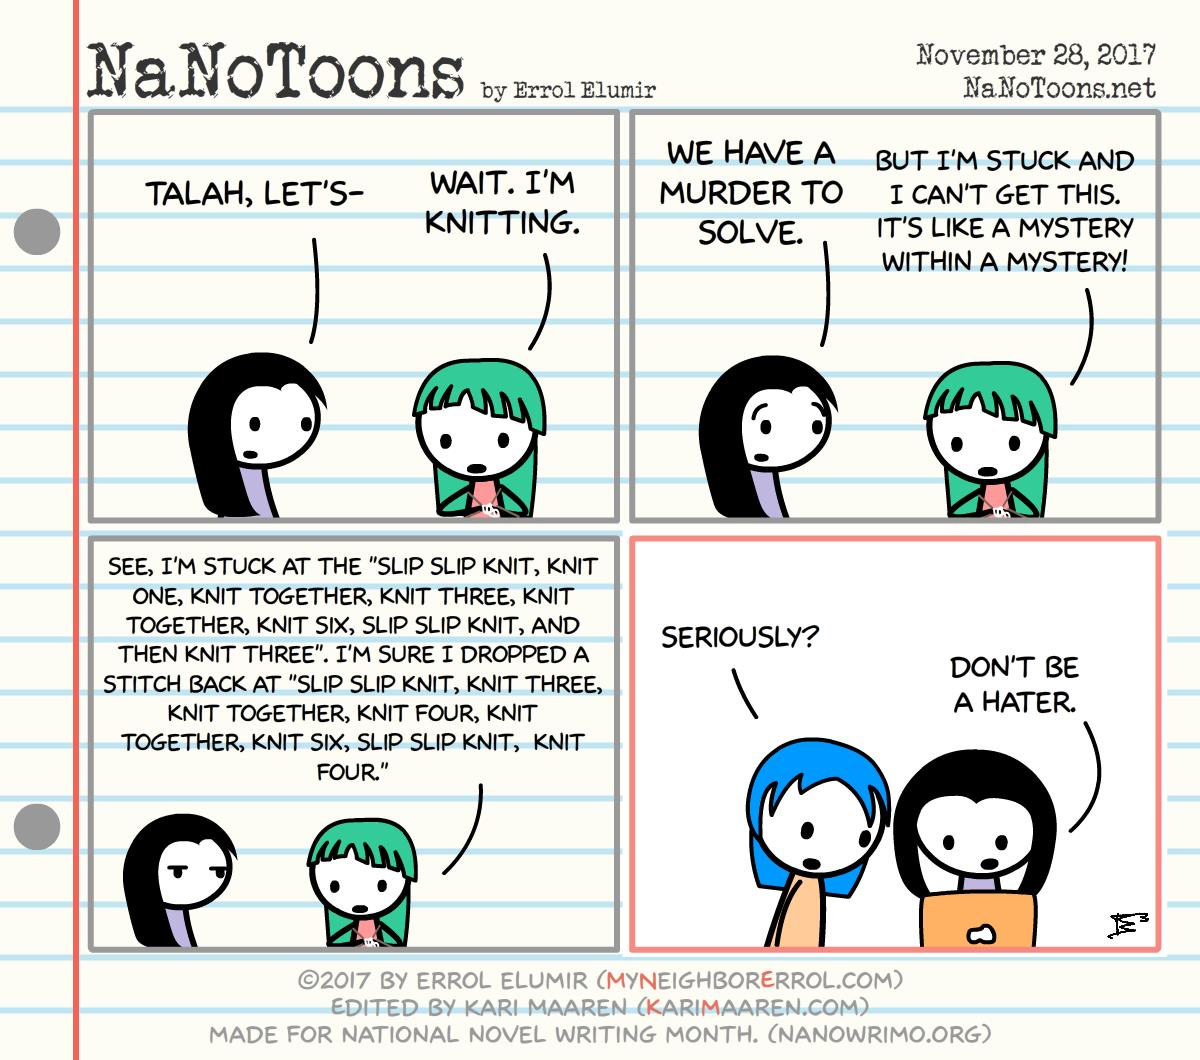 NaNoToons_2017_10_28